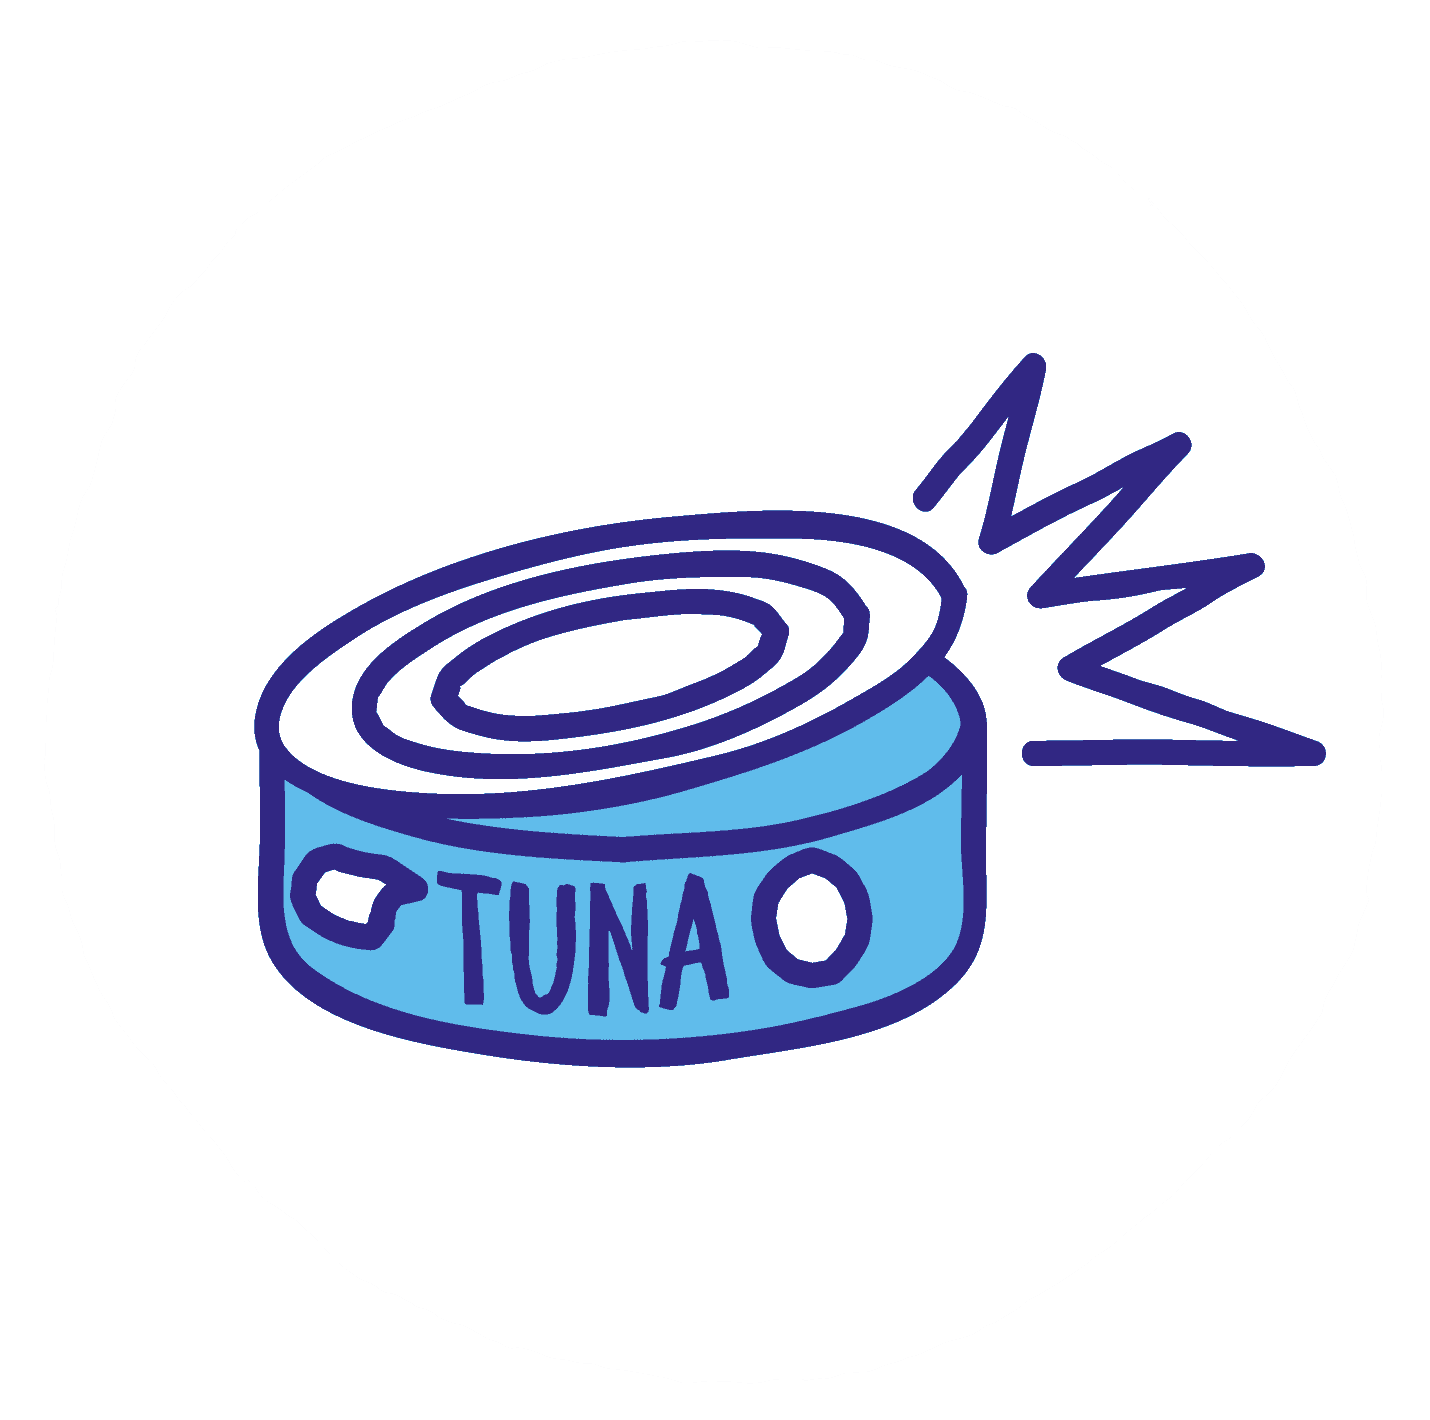 tuna can 002